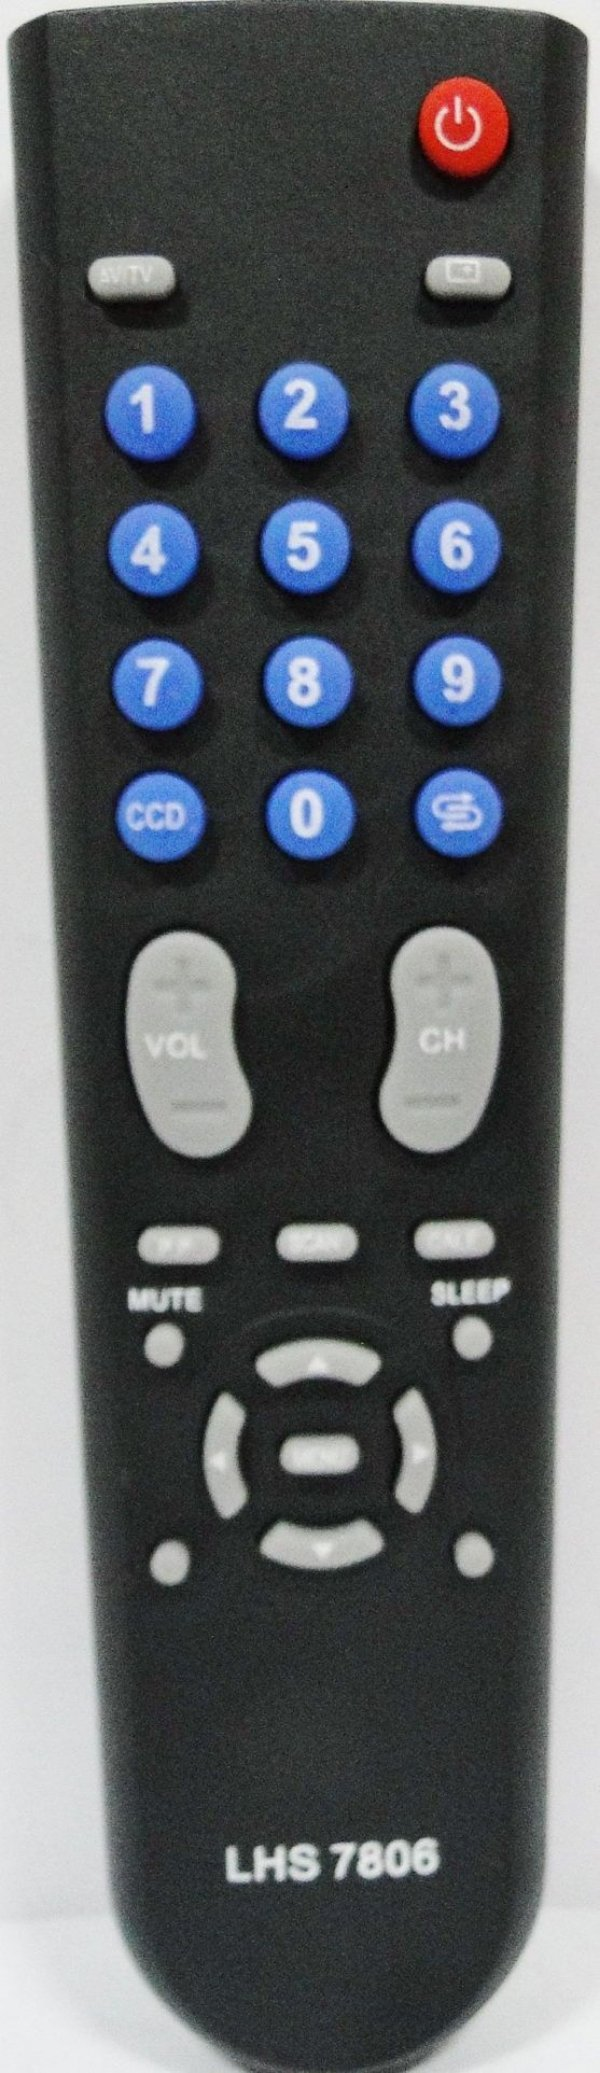 Controle Remoto TV Philco Lhs 7806